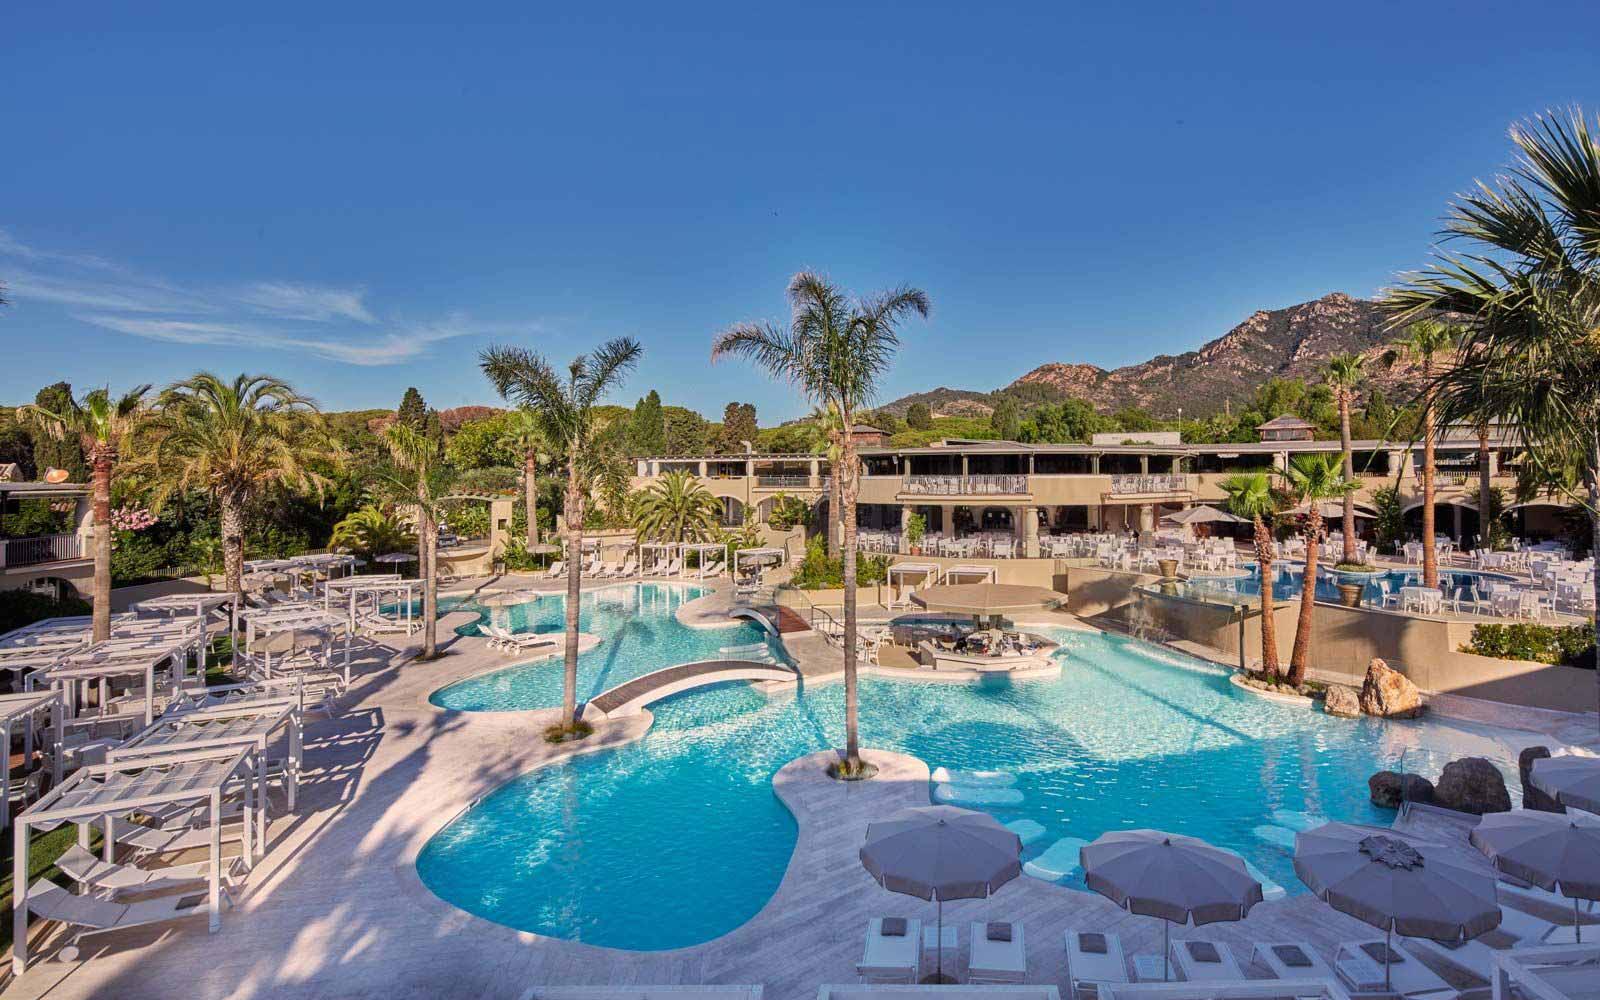 Oasis pool at the Forte Village Resort